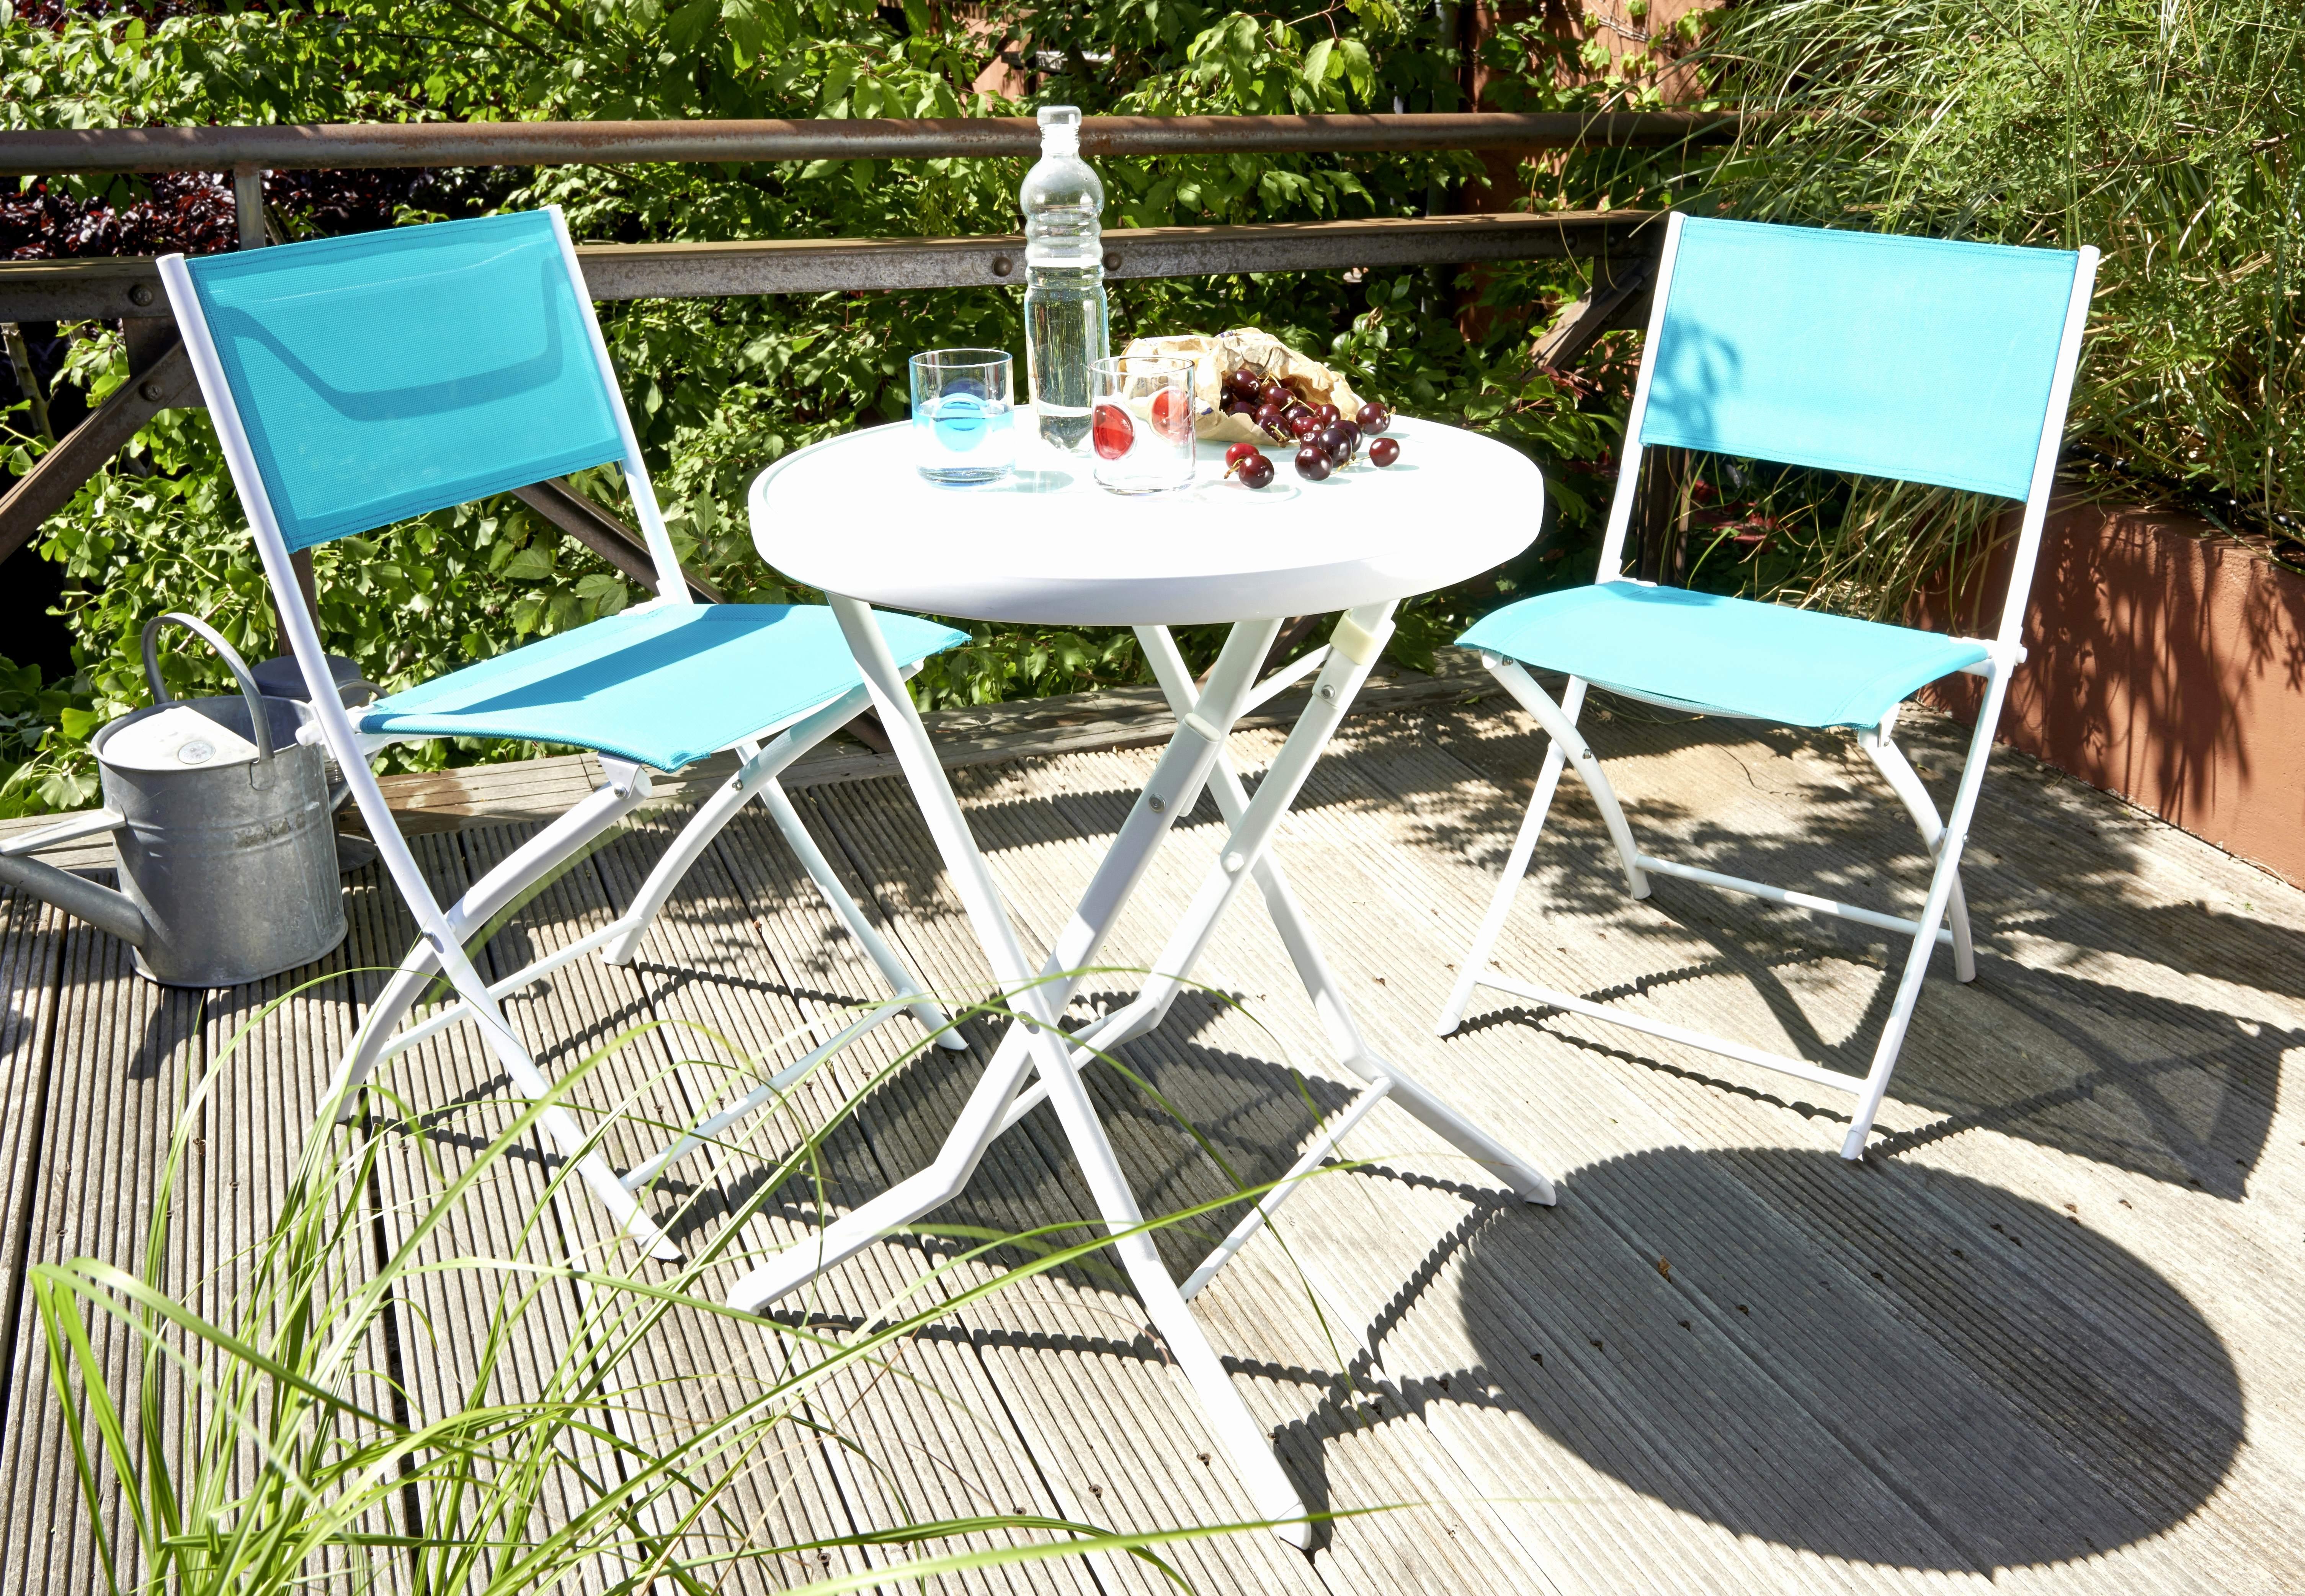 Table De Jardin Alinea Beau Photographie Mobilier Jardin Alinea Table Extensible Jardin Alinea Chaise 0d